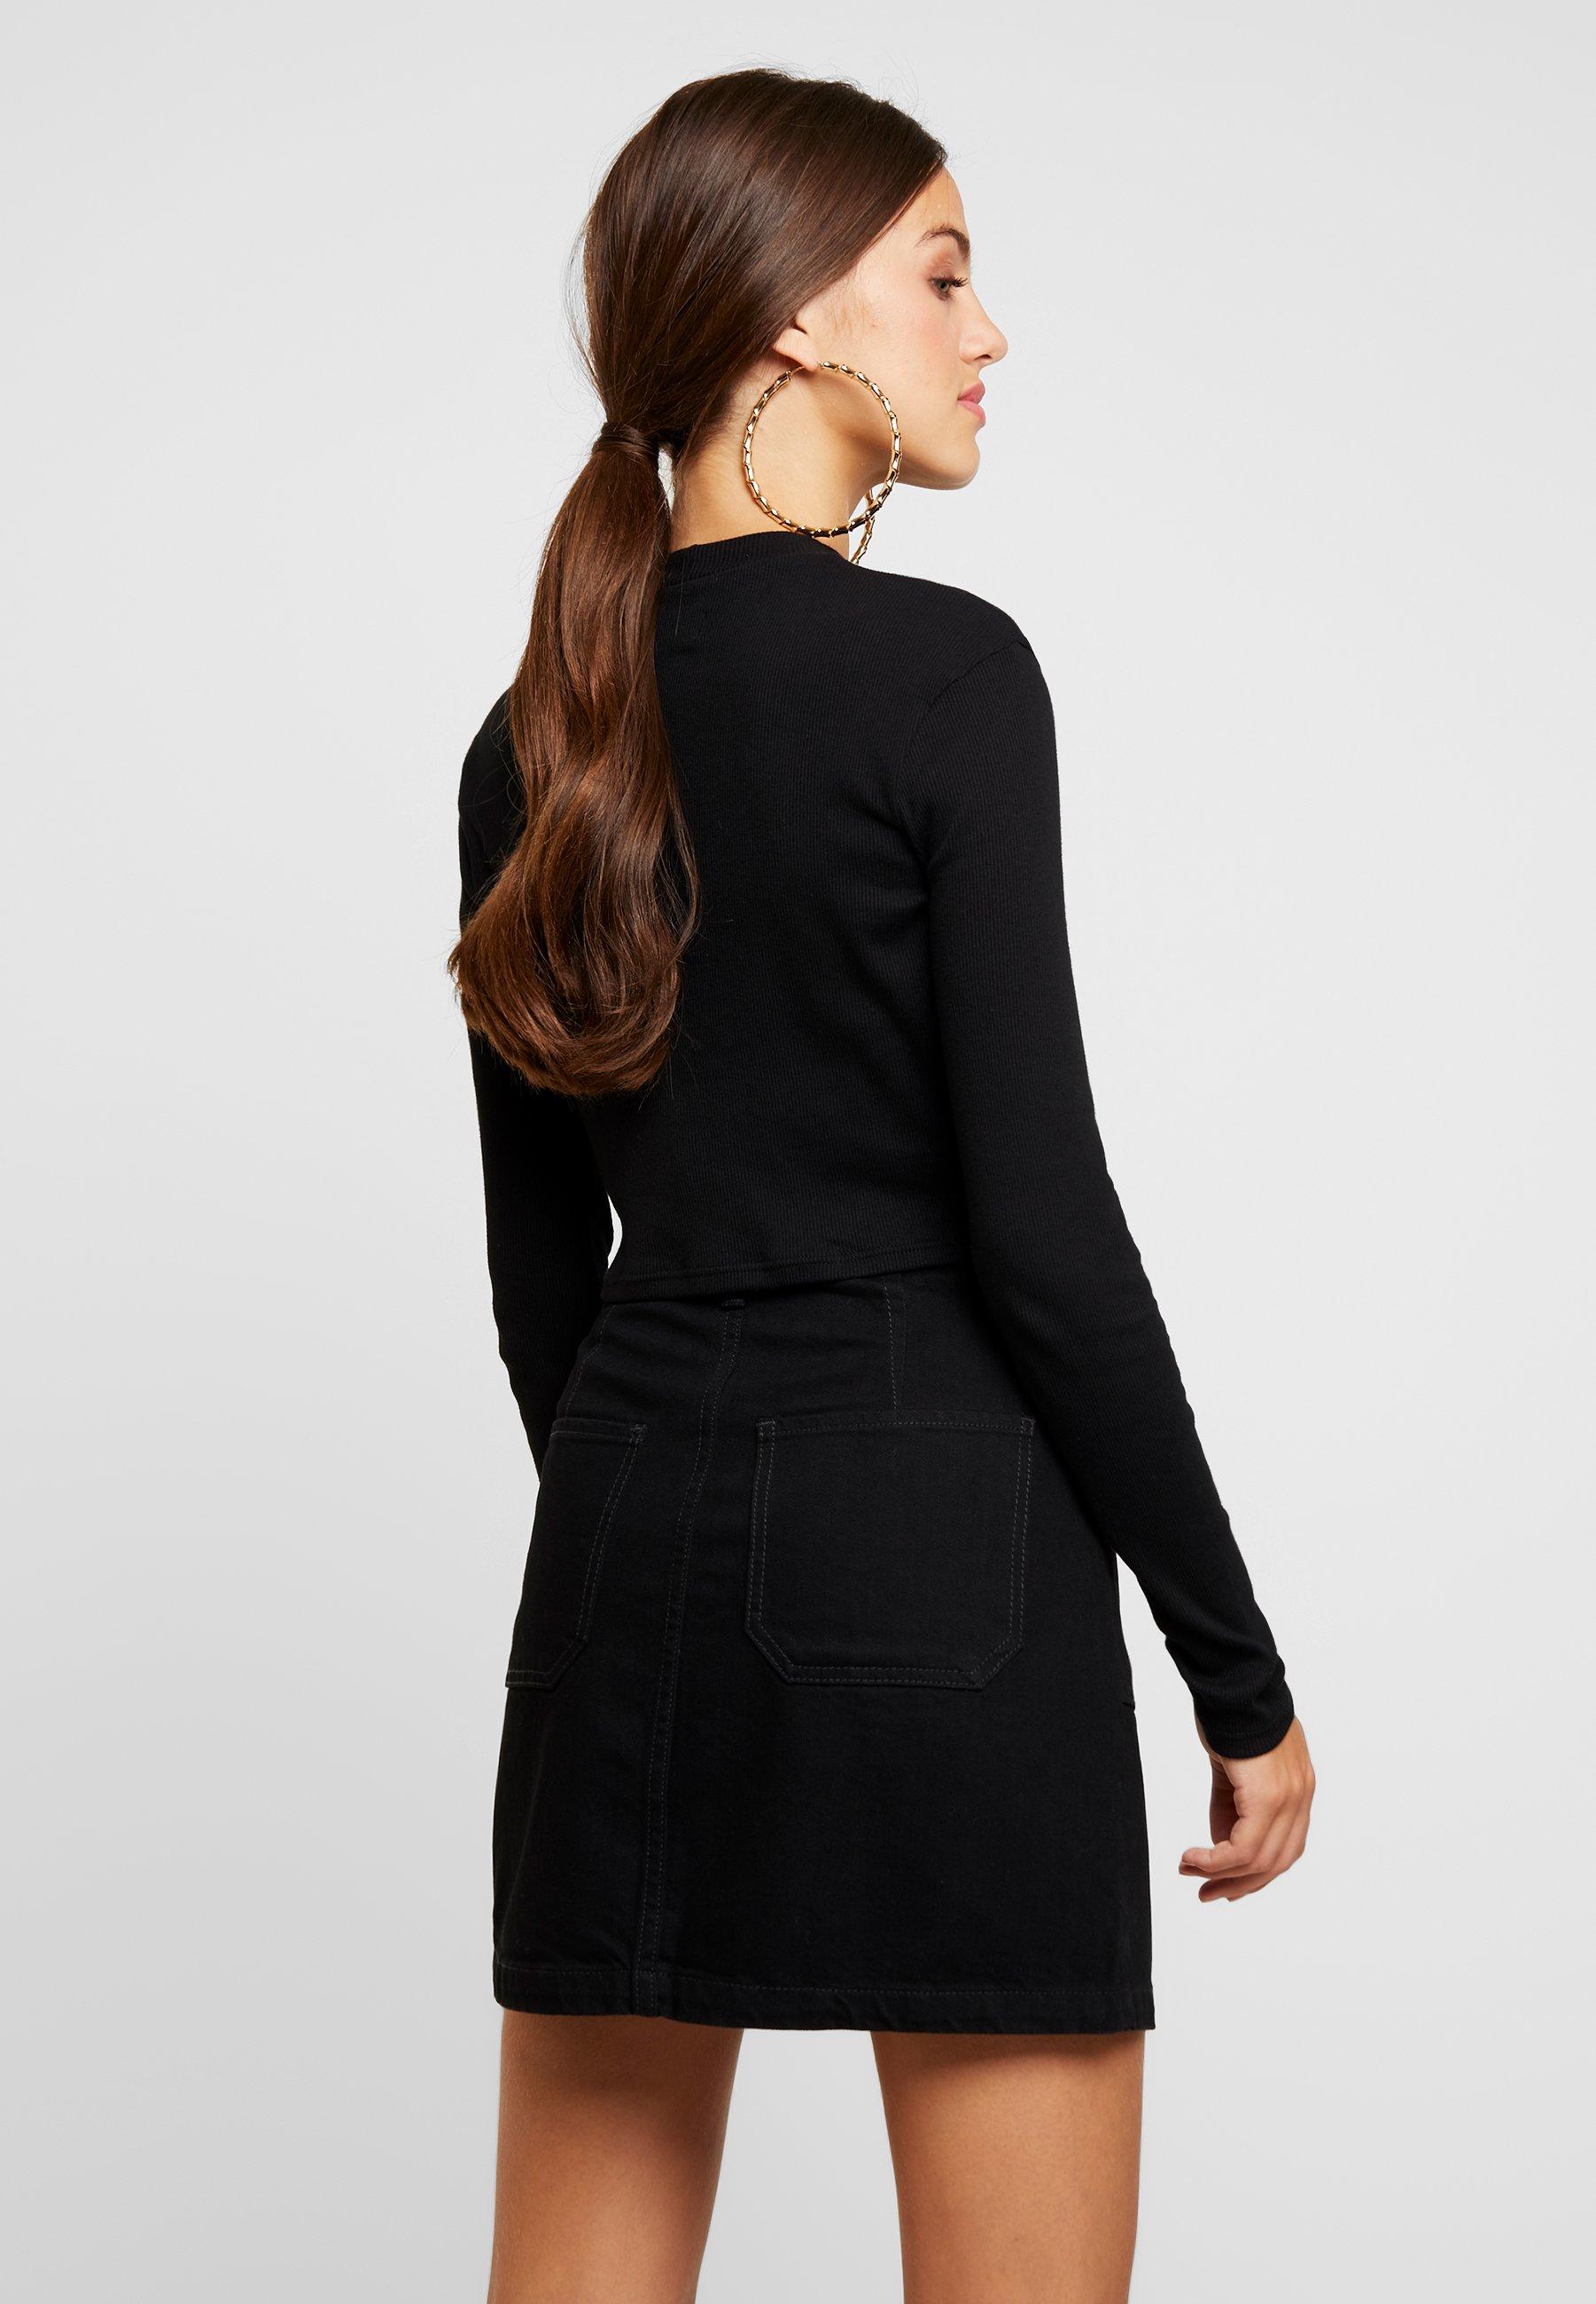 amp;Odd shirt Even manches black T à longues 1JlFcTK